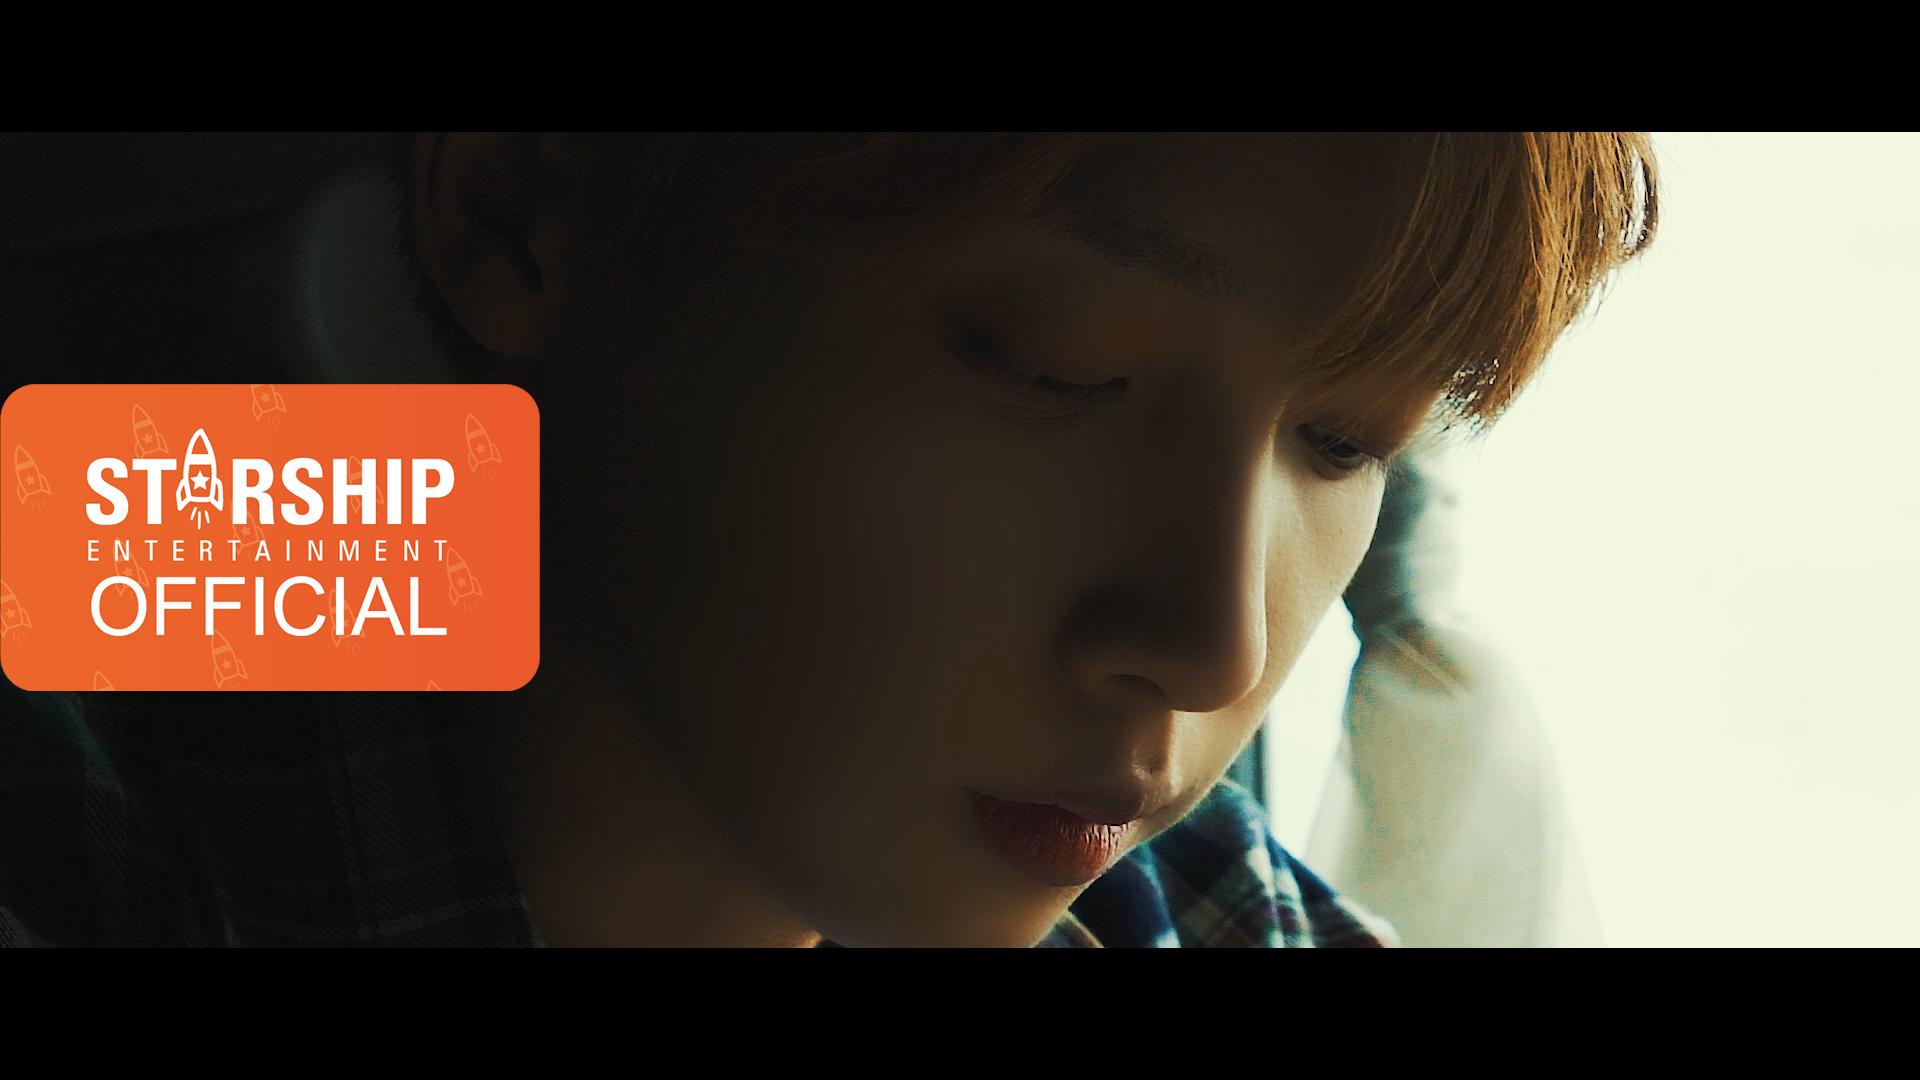 [MV] 정세운 - 20 SOMETHING (Prod. 멜로망스 정동환, 정세운) (JEONG SEWOON)